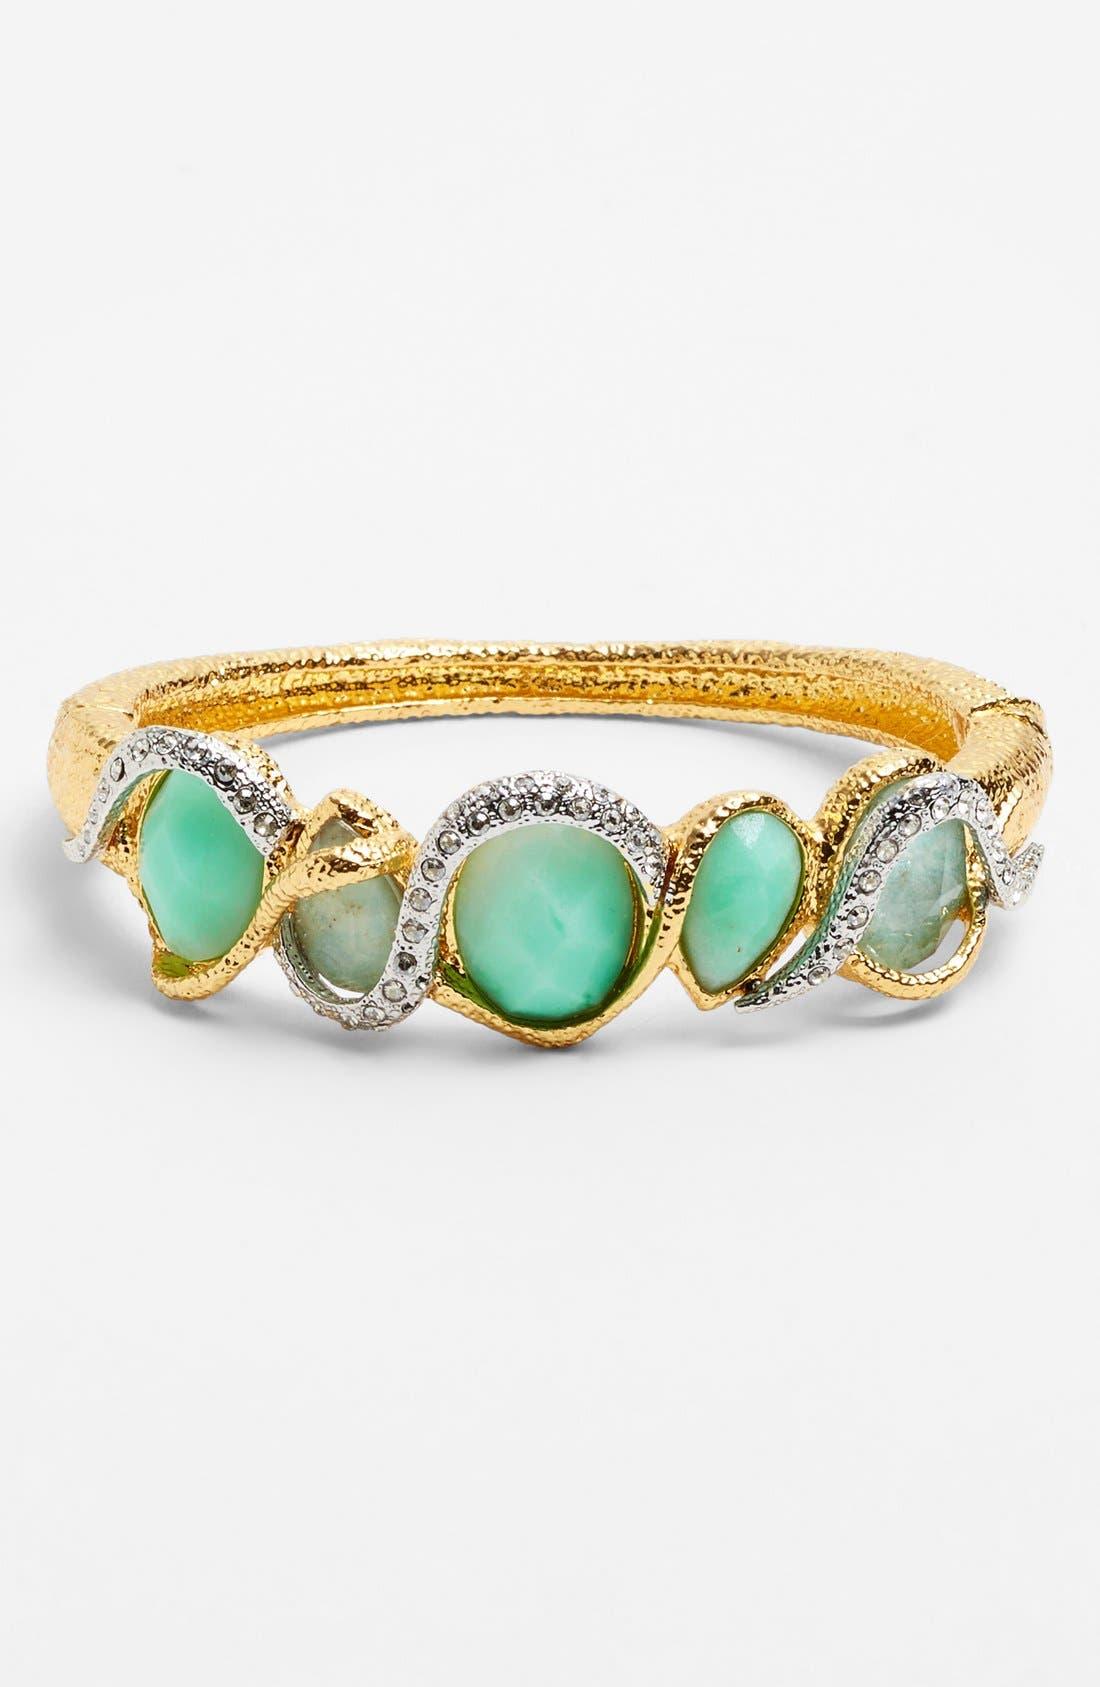 Main Image - Alexis Bittar 'Elements - Maldivian' Semiprecious Stone Bracelet